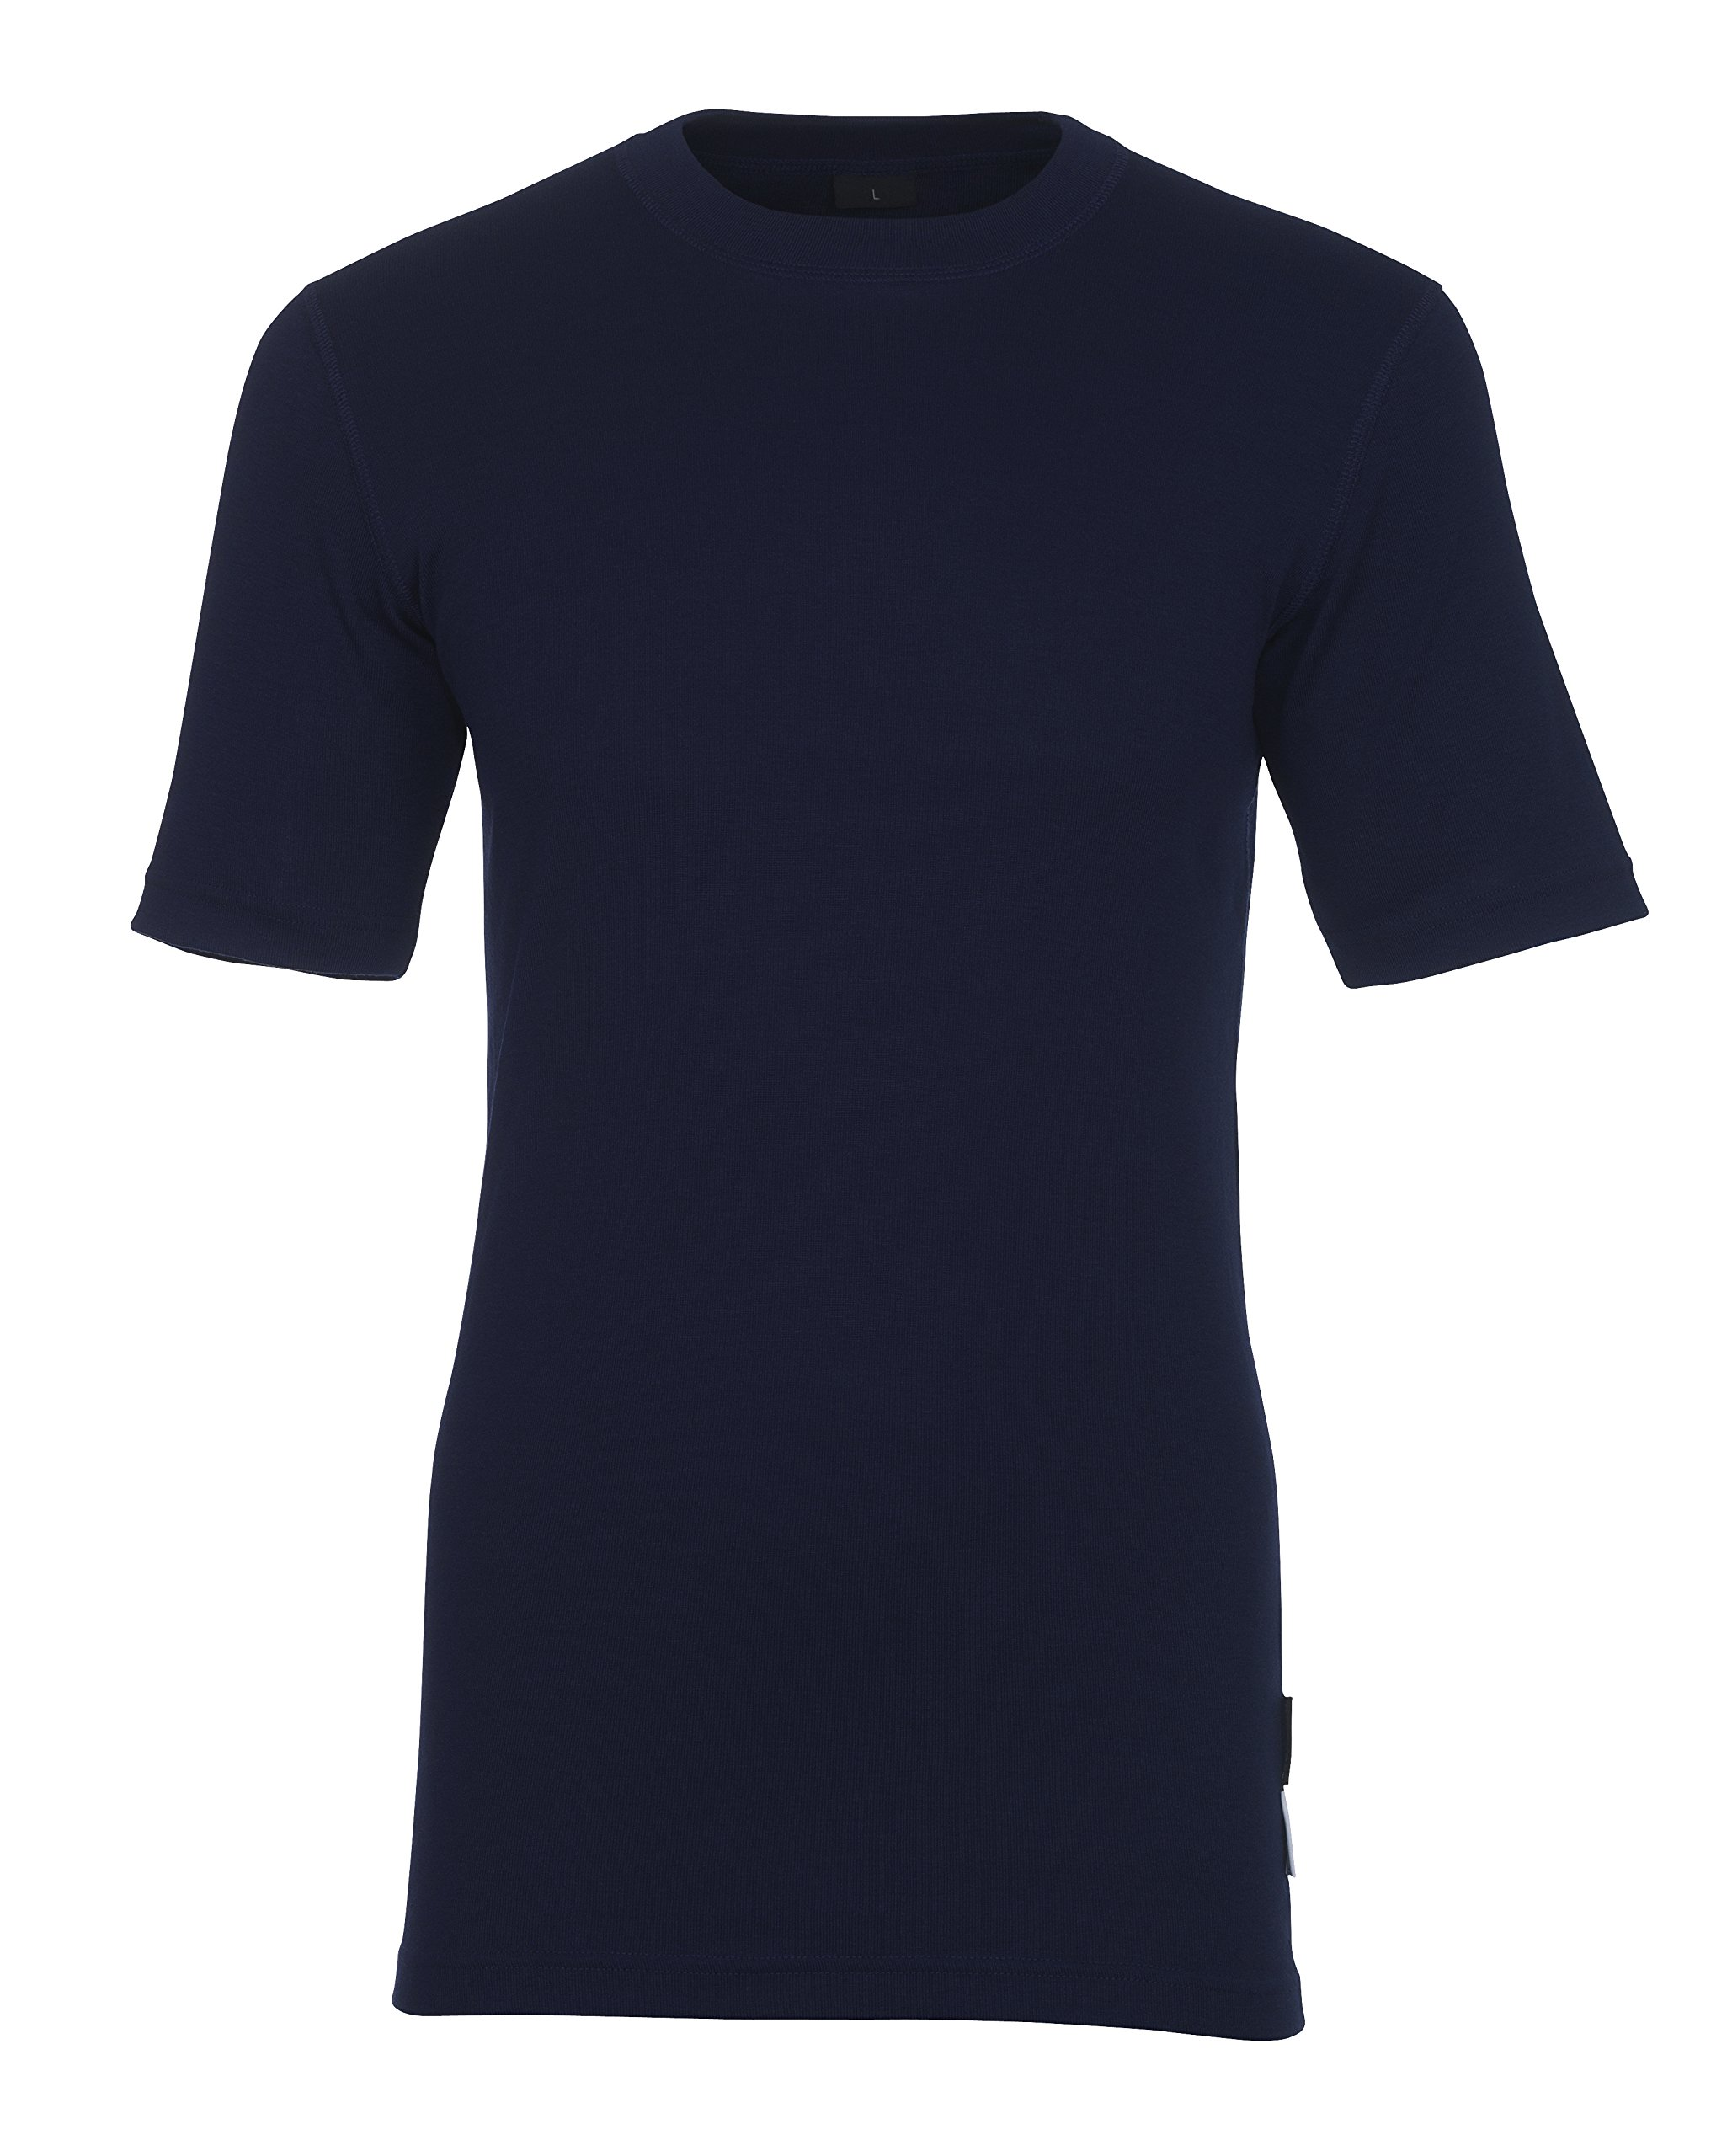 Mascot 00597-350-01-L''Kalix'' Under Shirt, Marine Blue, Large